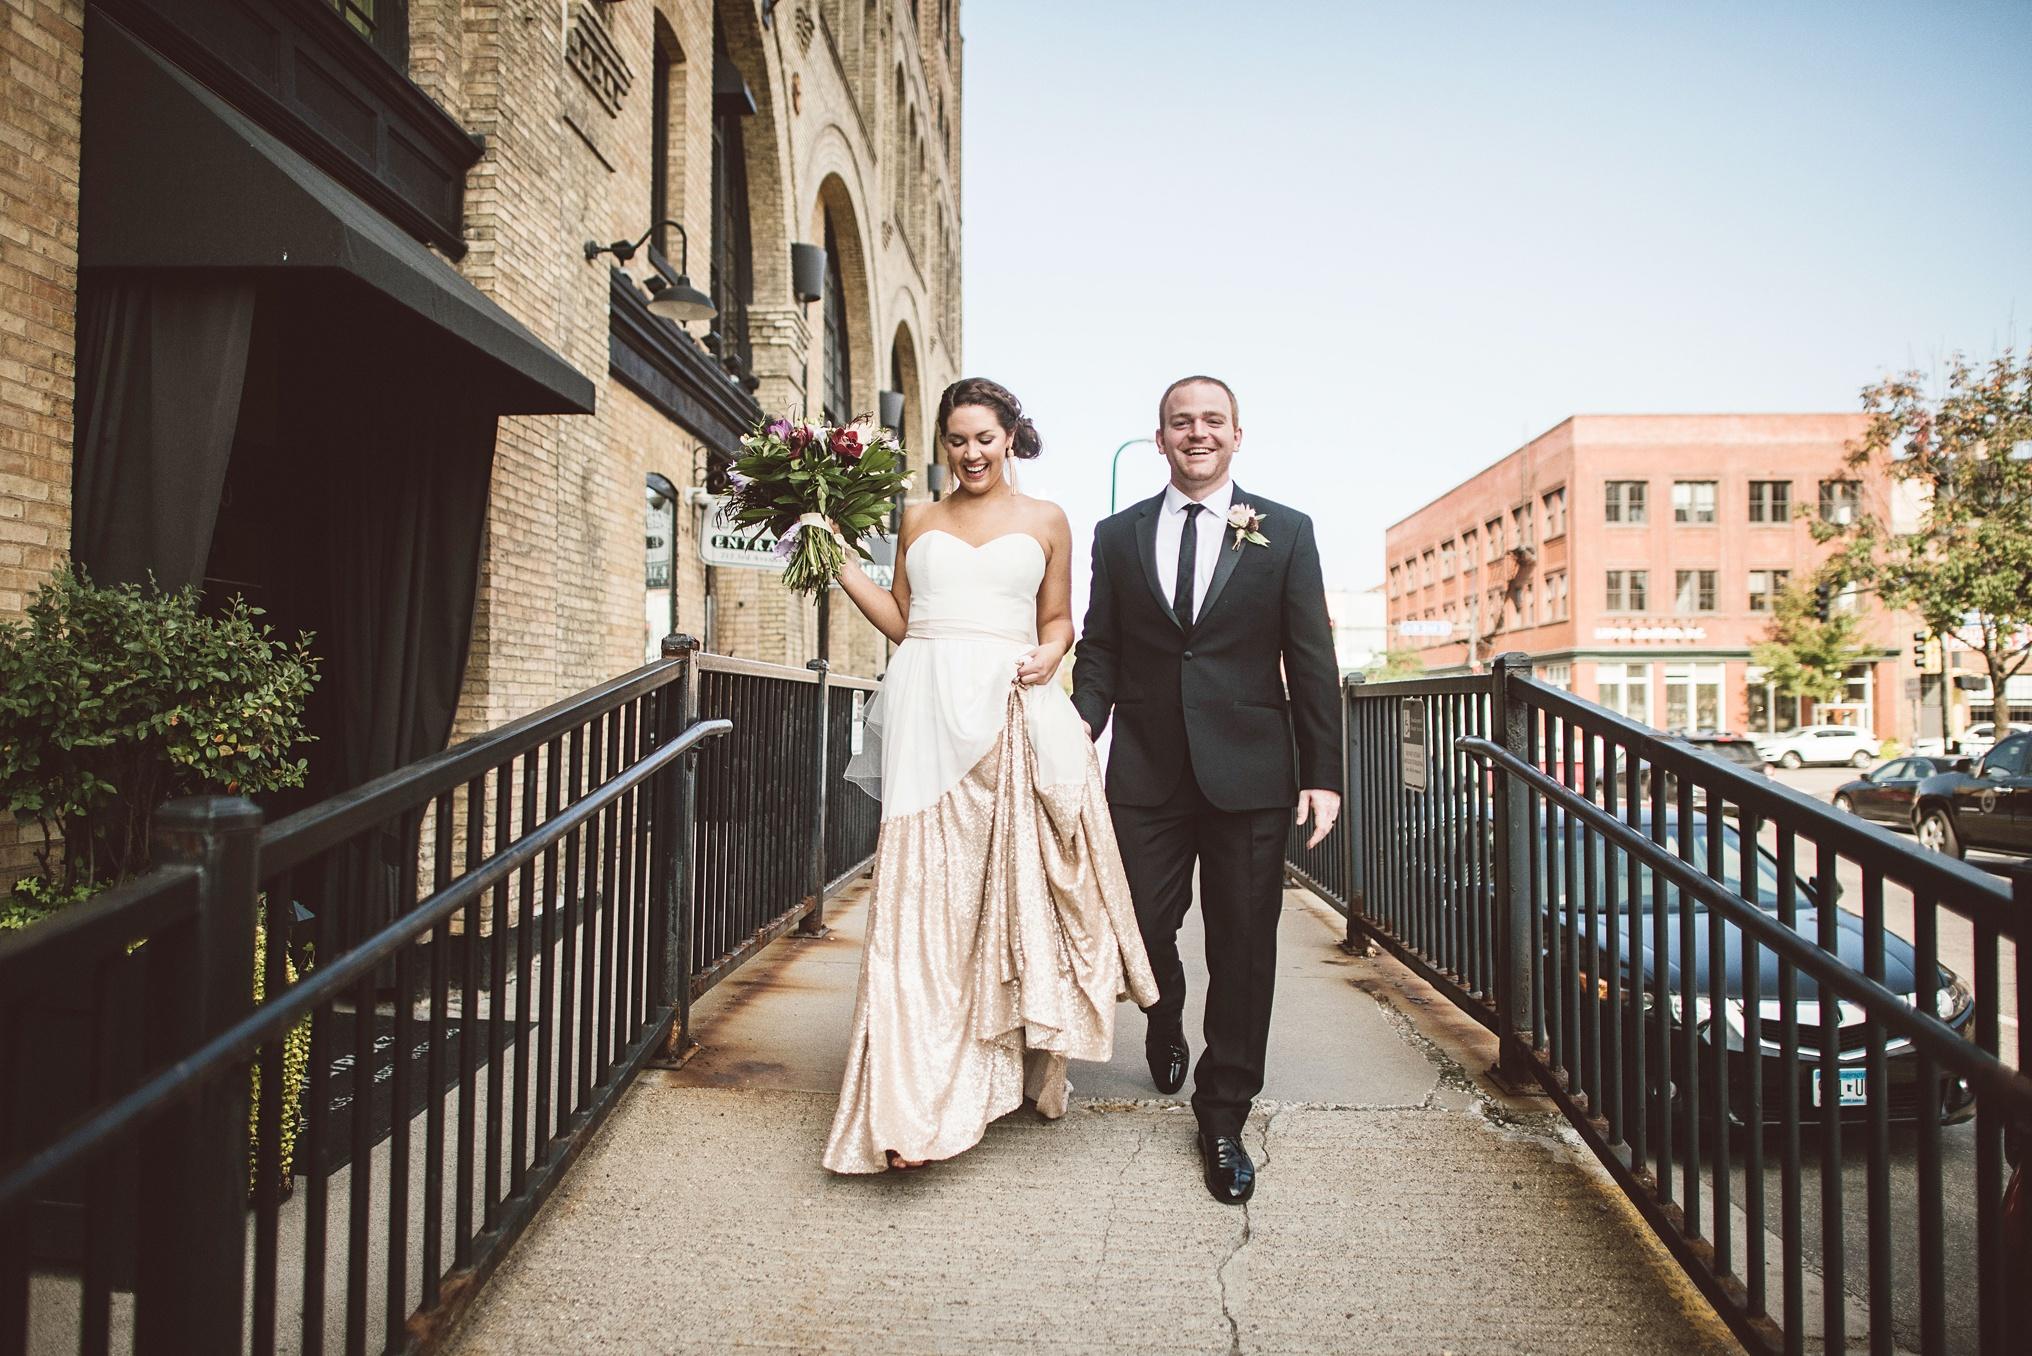 best_wedding_photography_2017_by_lucas_botz_photography_152.jpg